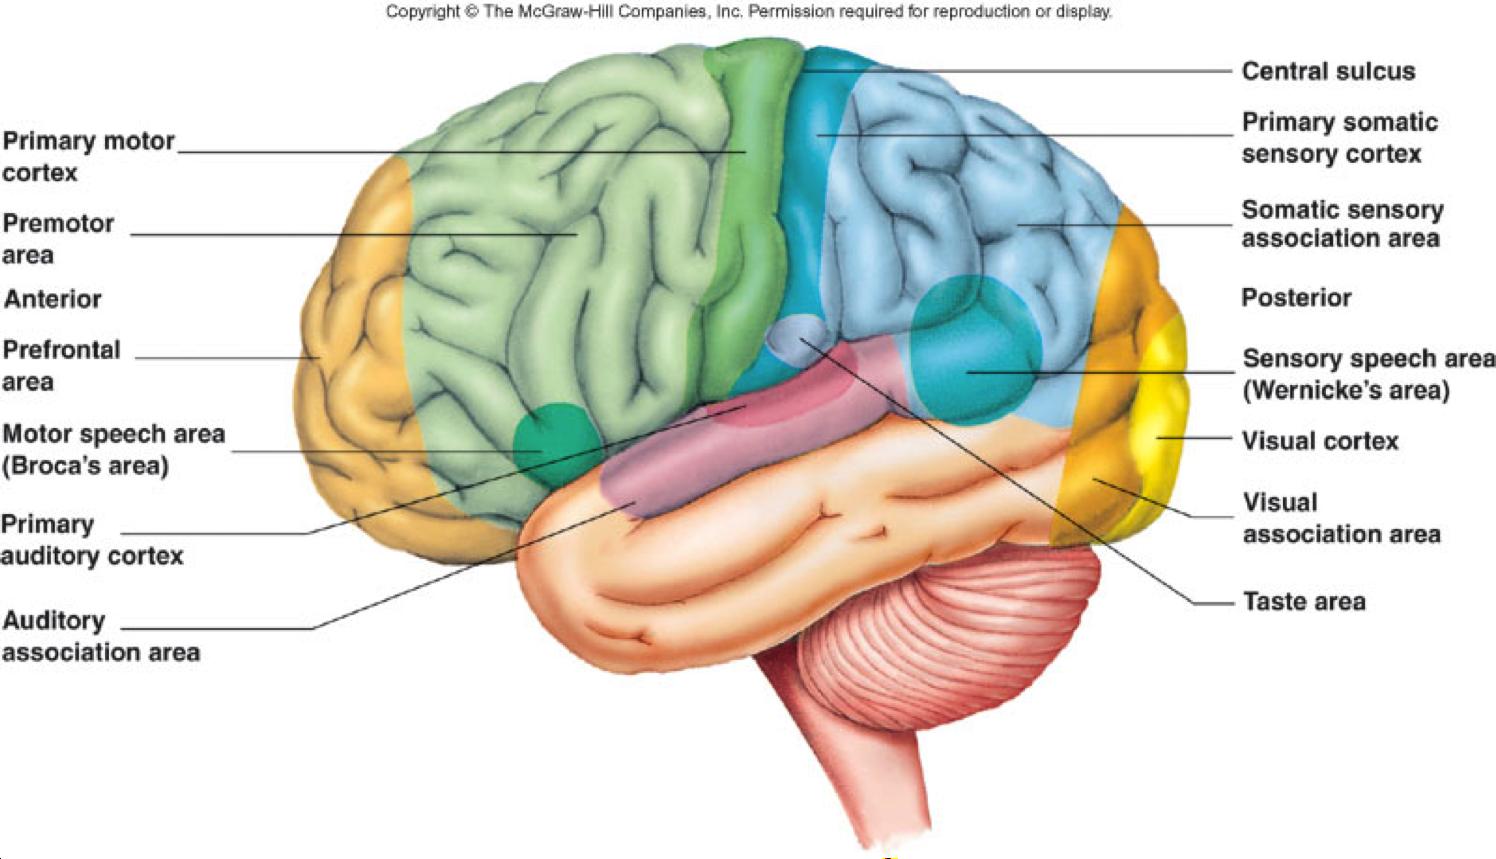 primary motor cortex - Google Search   Brain cortex, Motor ...